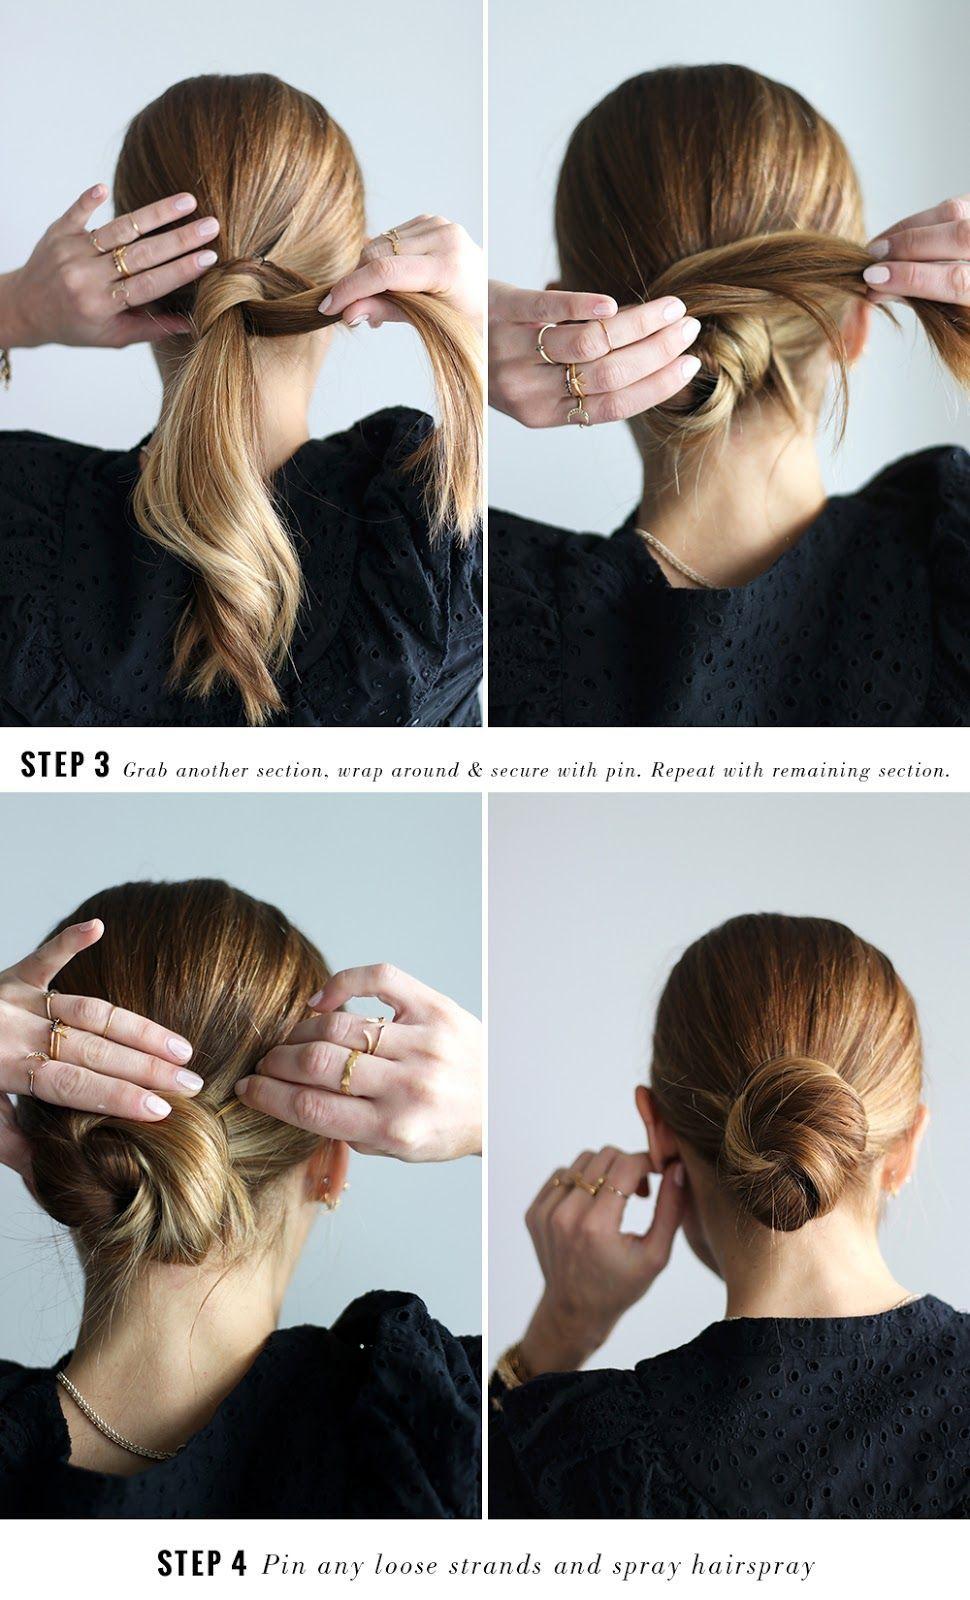 Diy File The Easiest Hair Bun Tutorial The Vault Files Easy